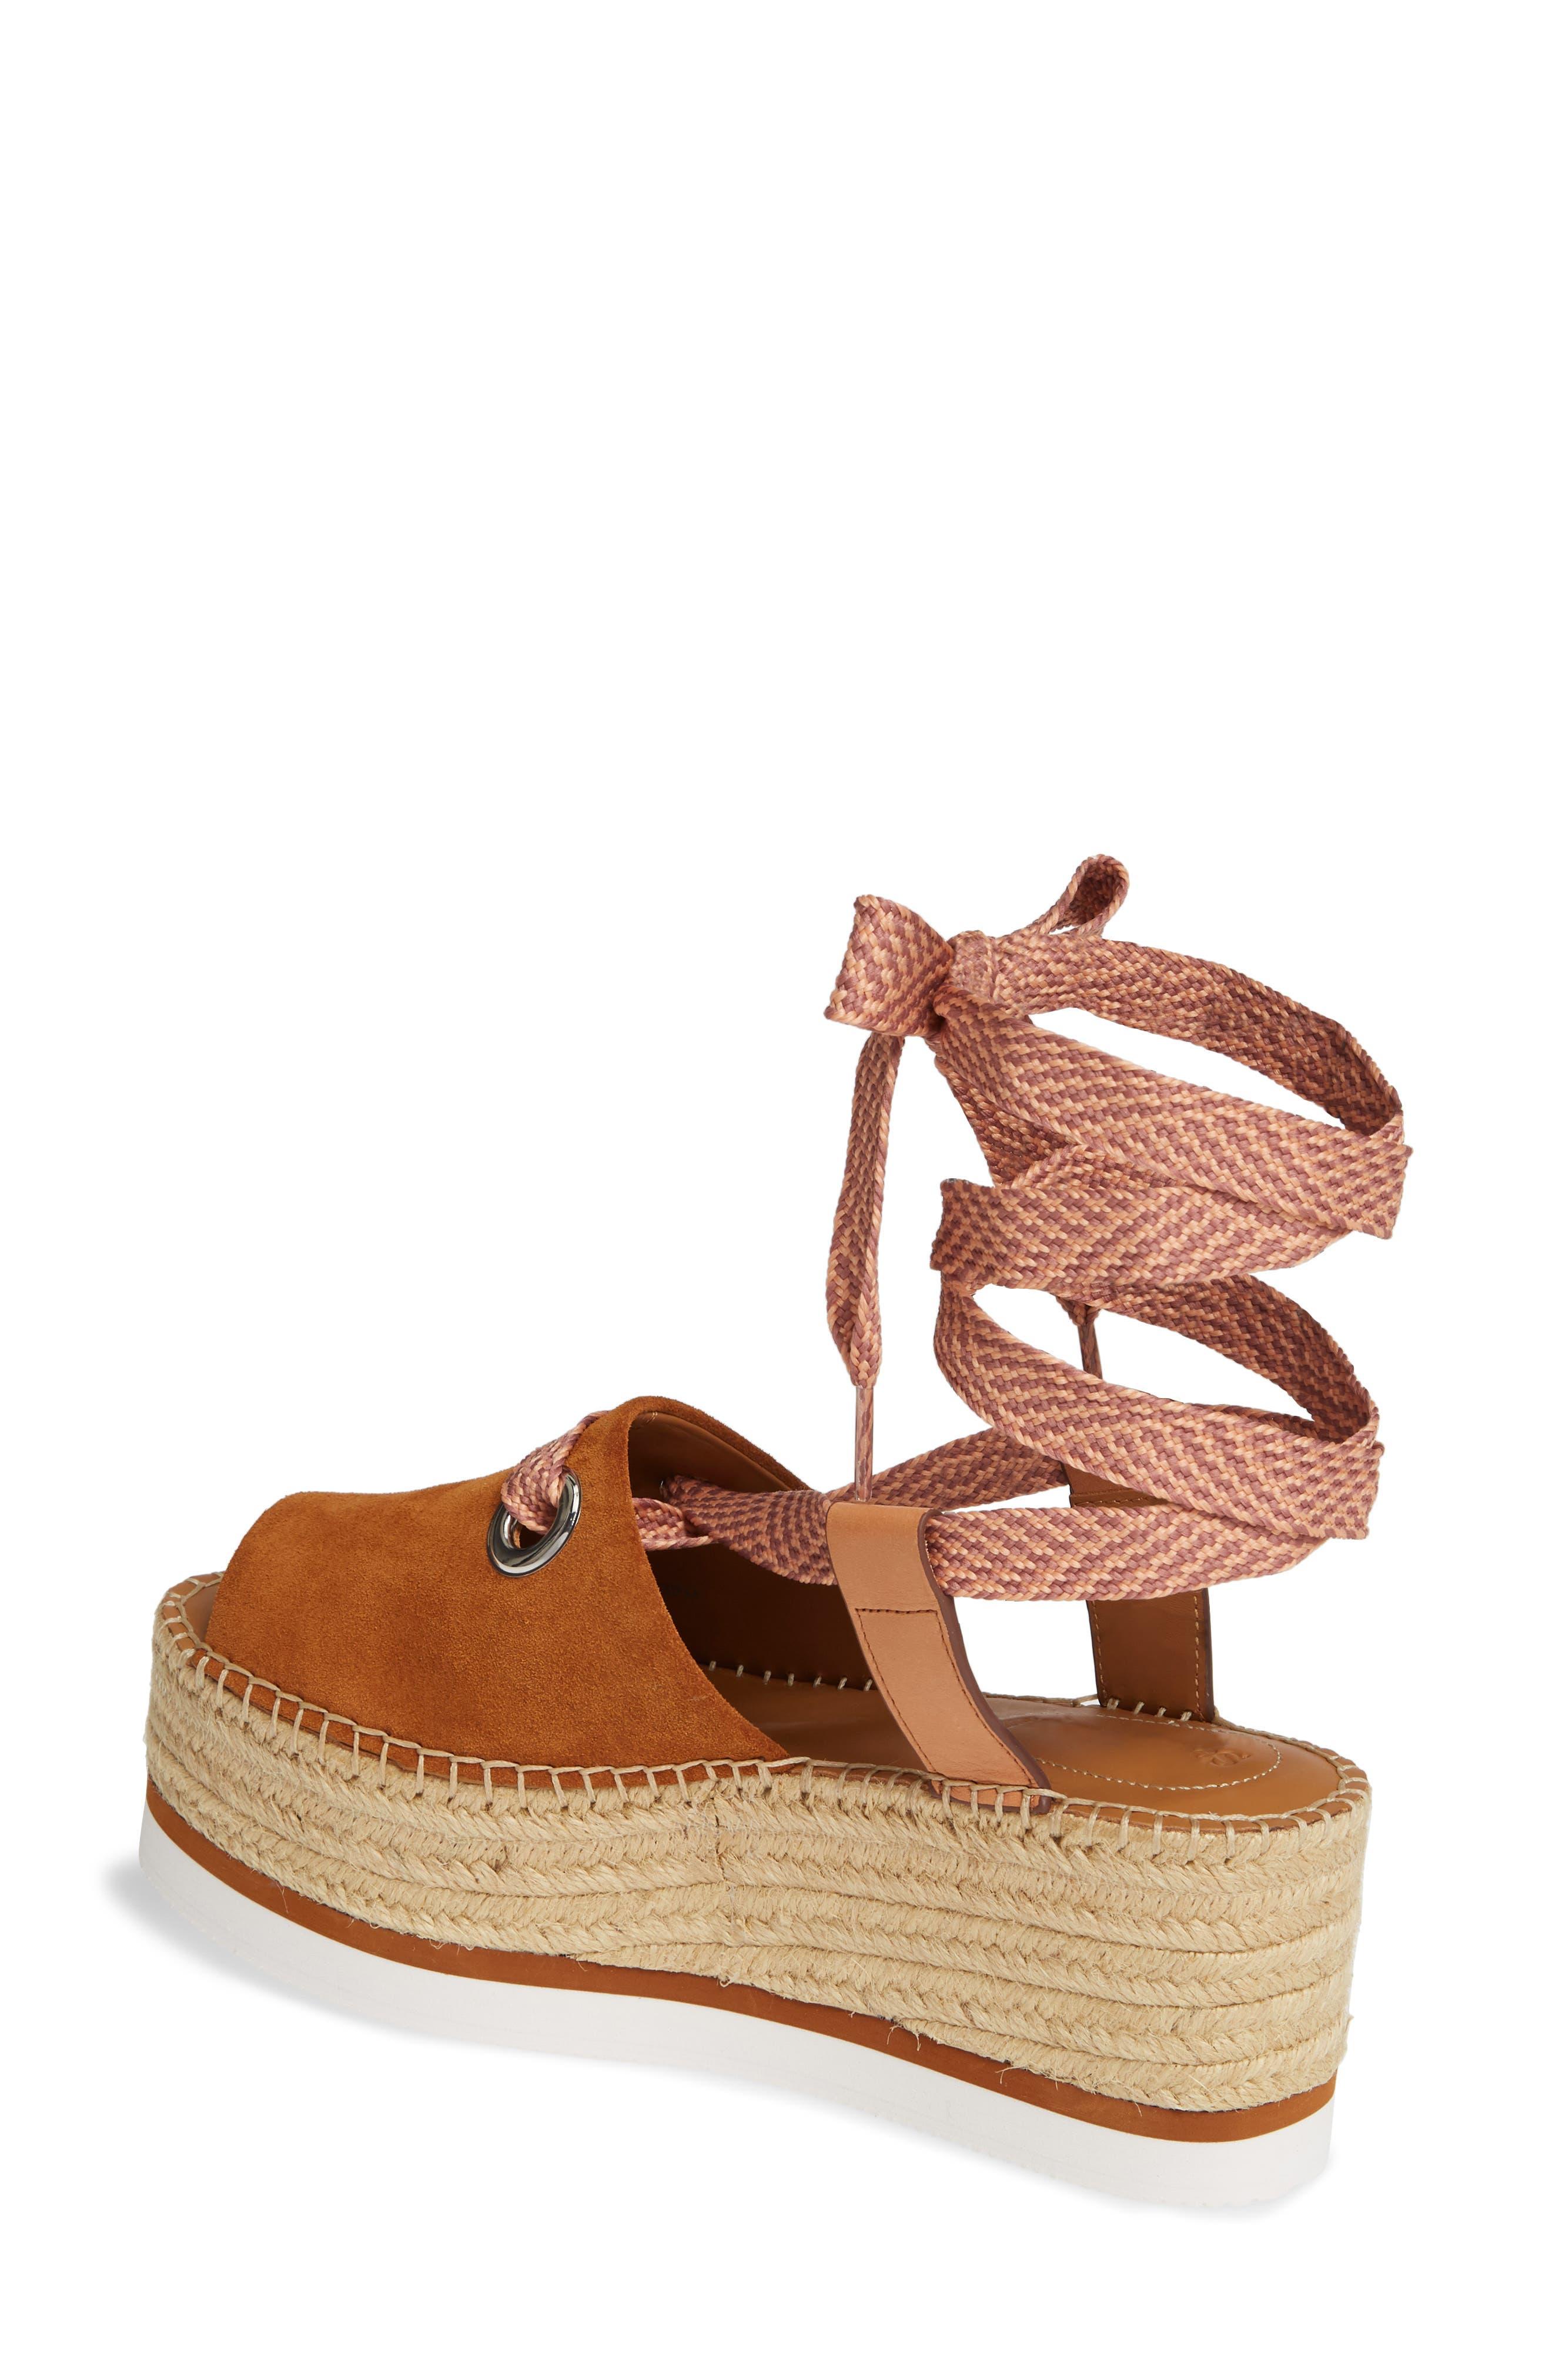 Glyn Amber Platform Ankle Wrap Sandal,                             Alternate thumbnail 2, color,                             TAN